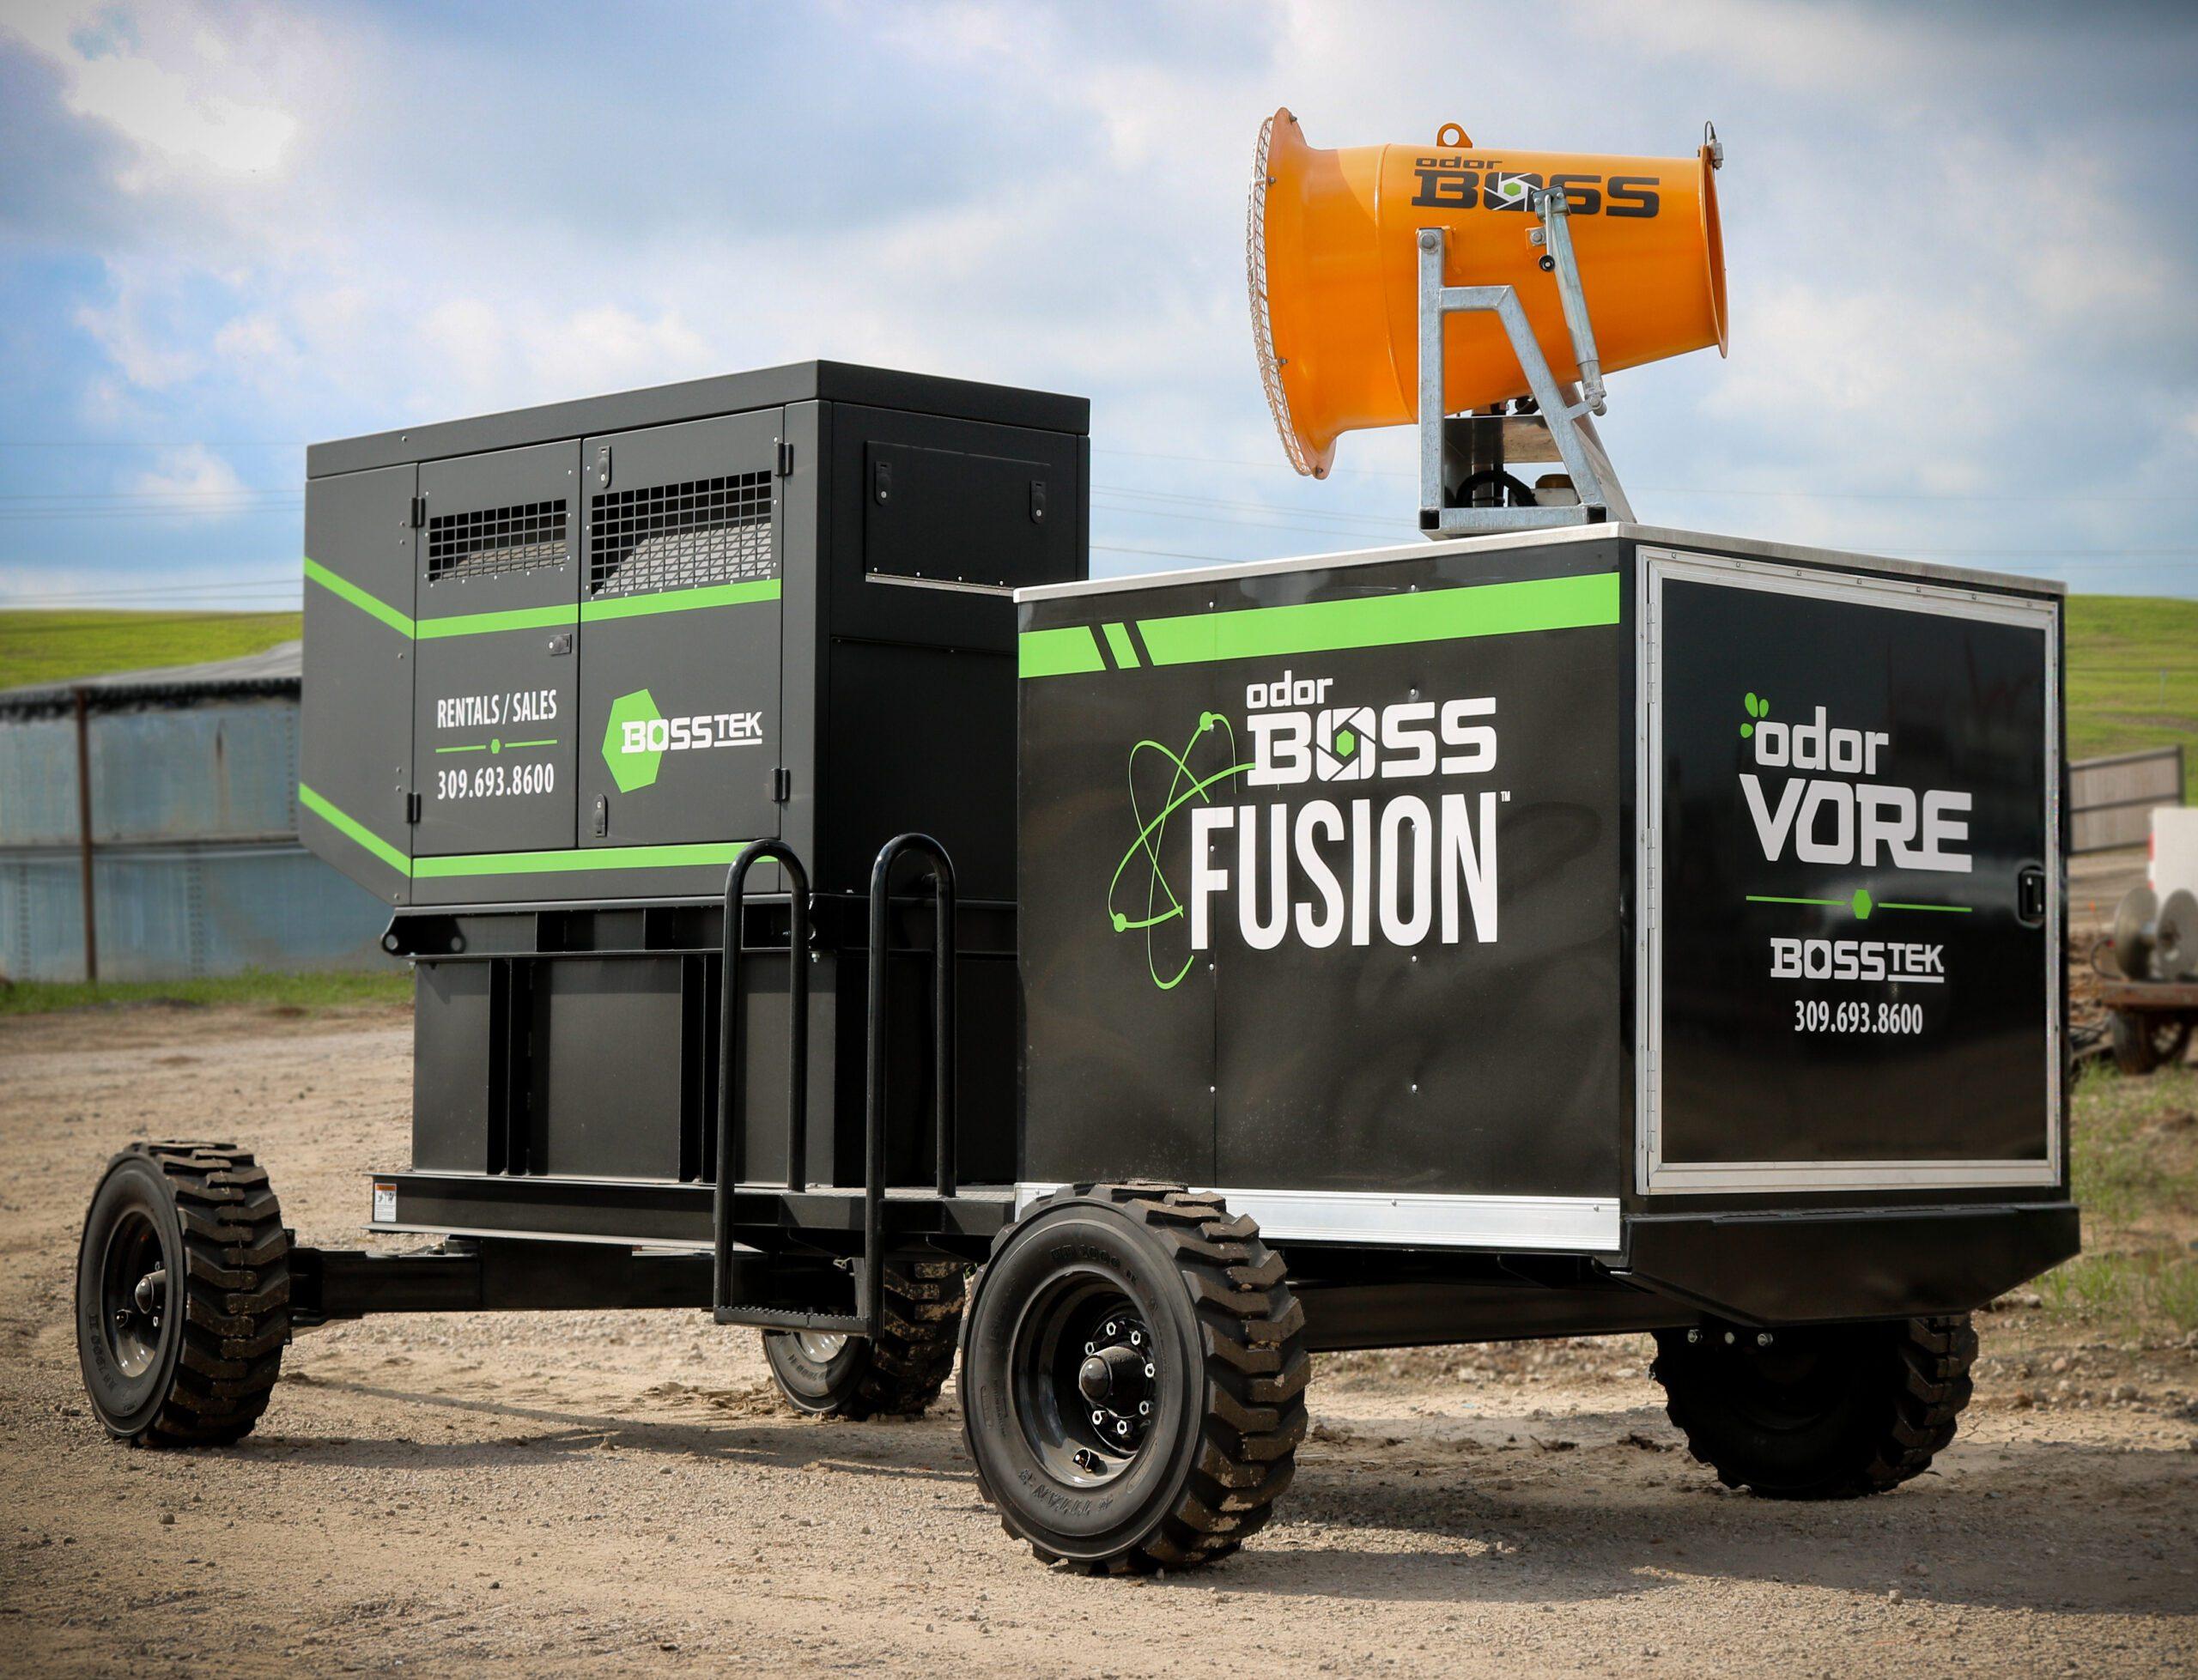 OdorBoss Fusion Mobile Odor Control Equipment